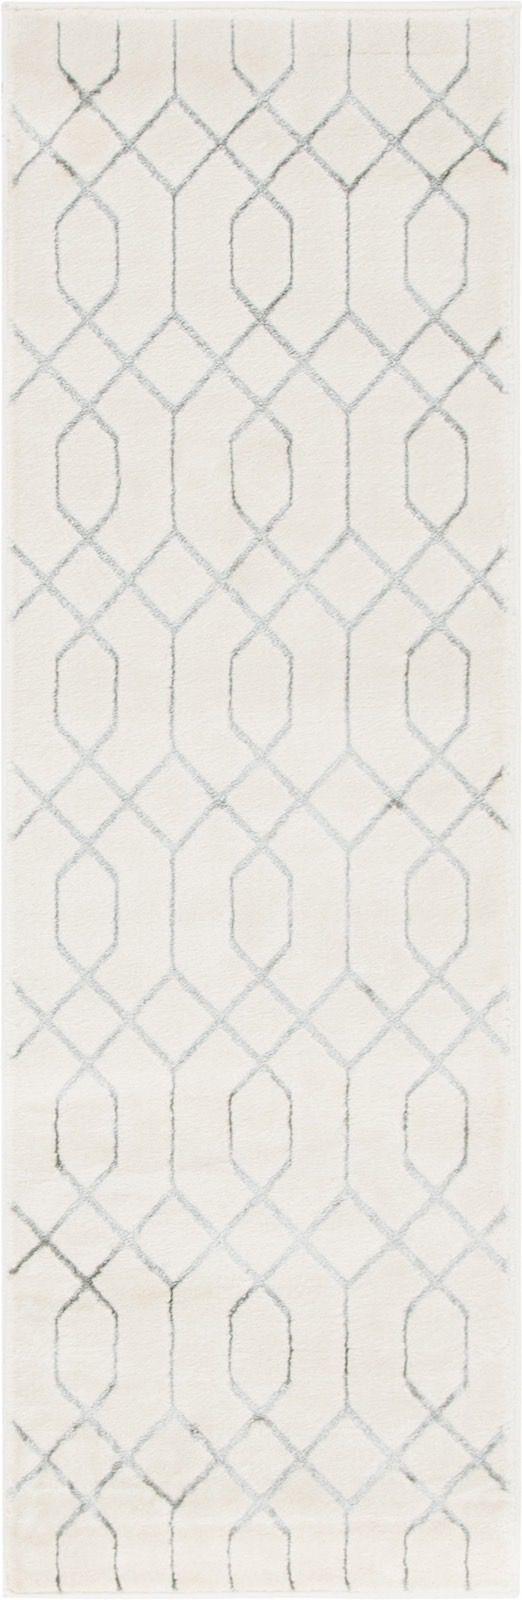 unique loom glam contemporary area rug collection